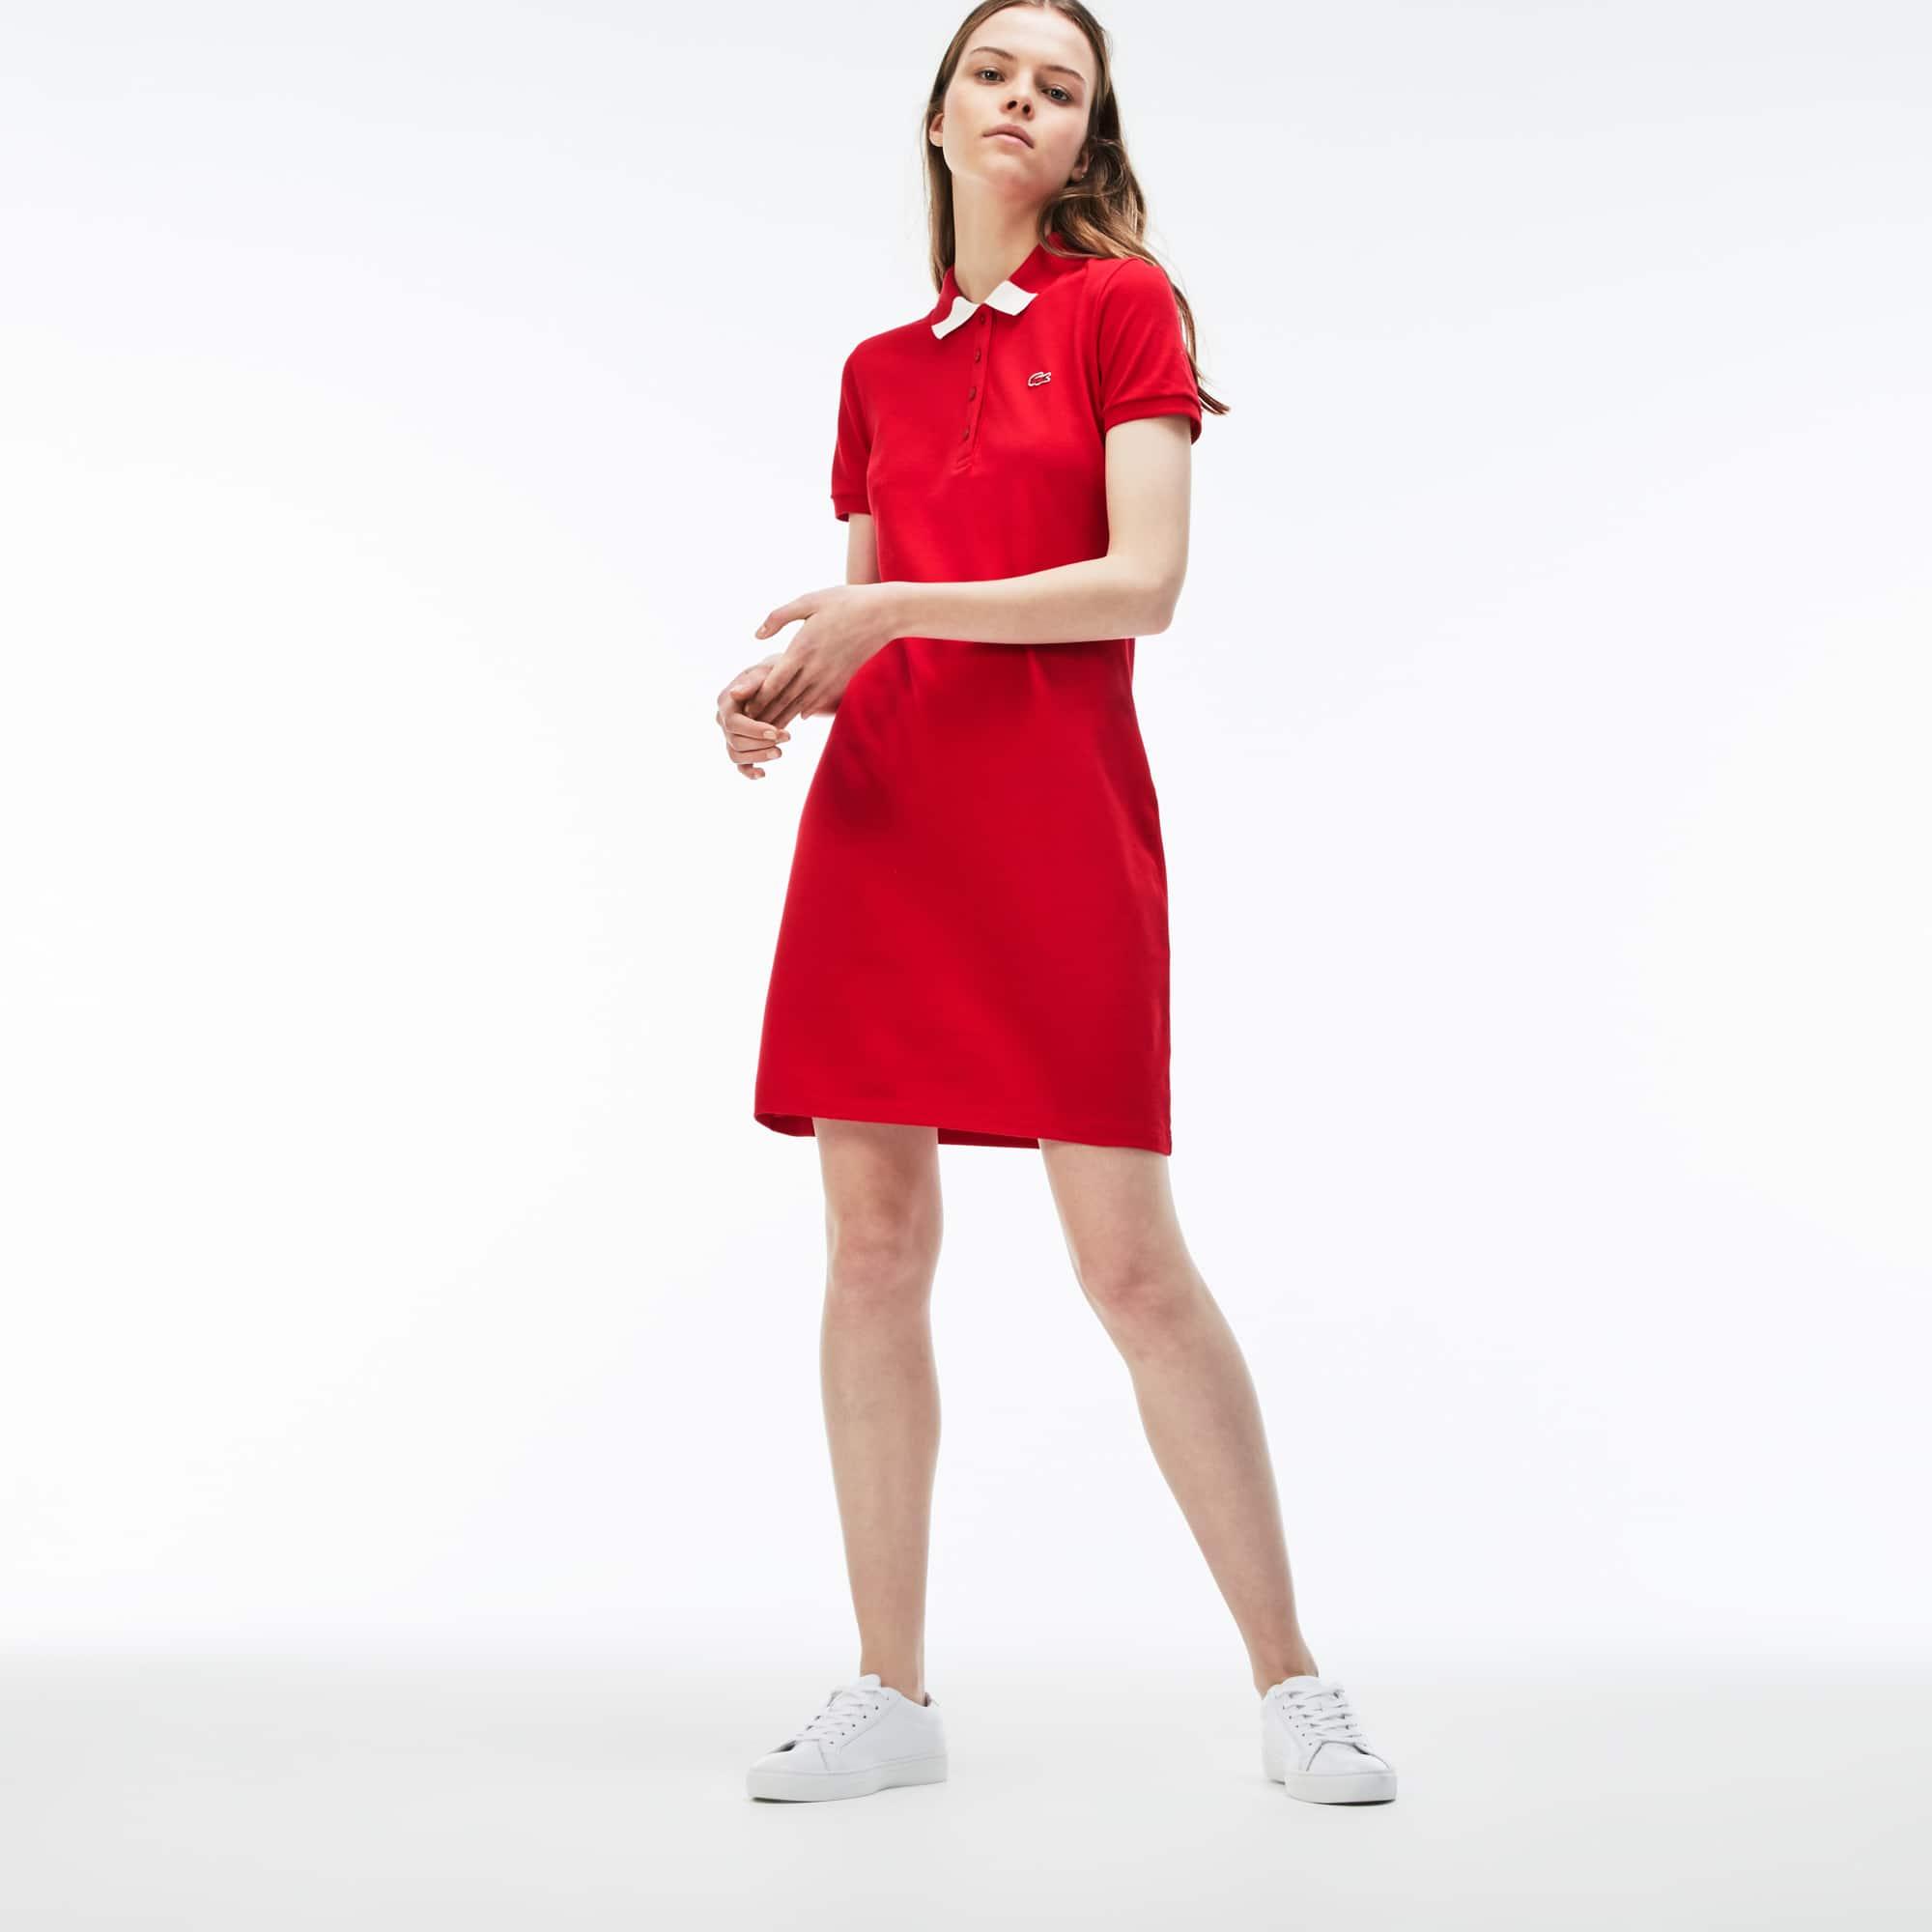 Slim Fit Damen-Polokleid aus zweifarbigem Mini-Piqué mit Stretch